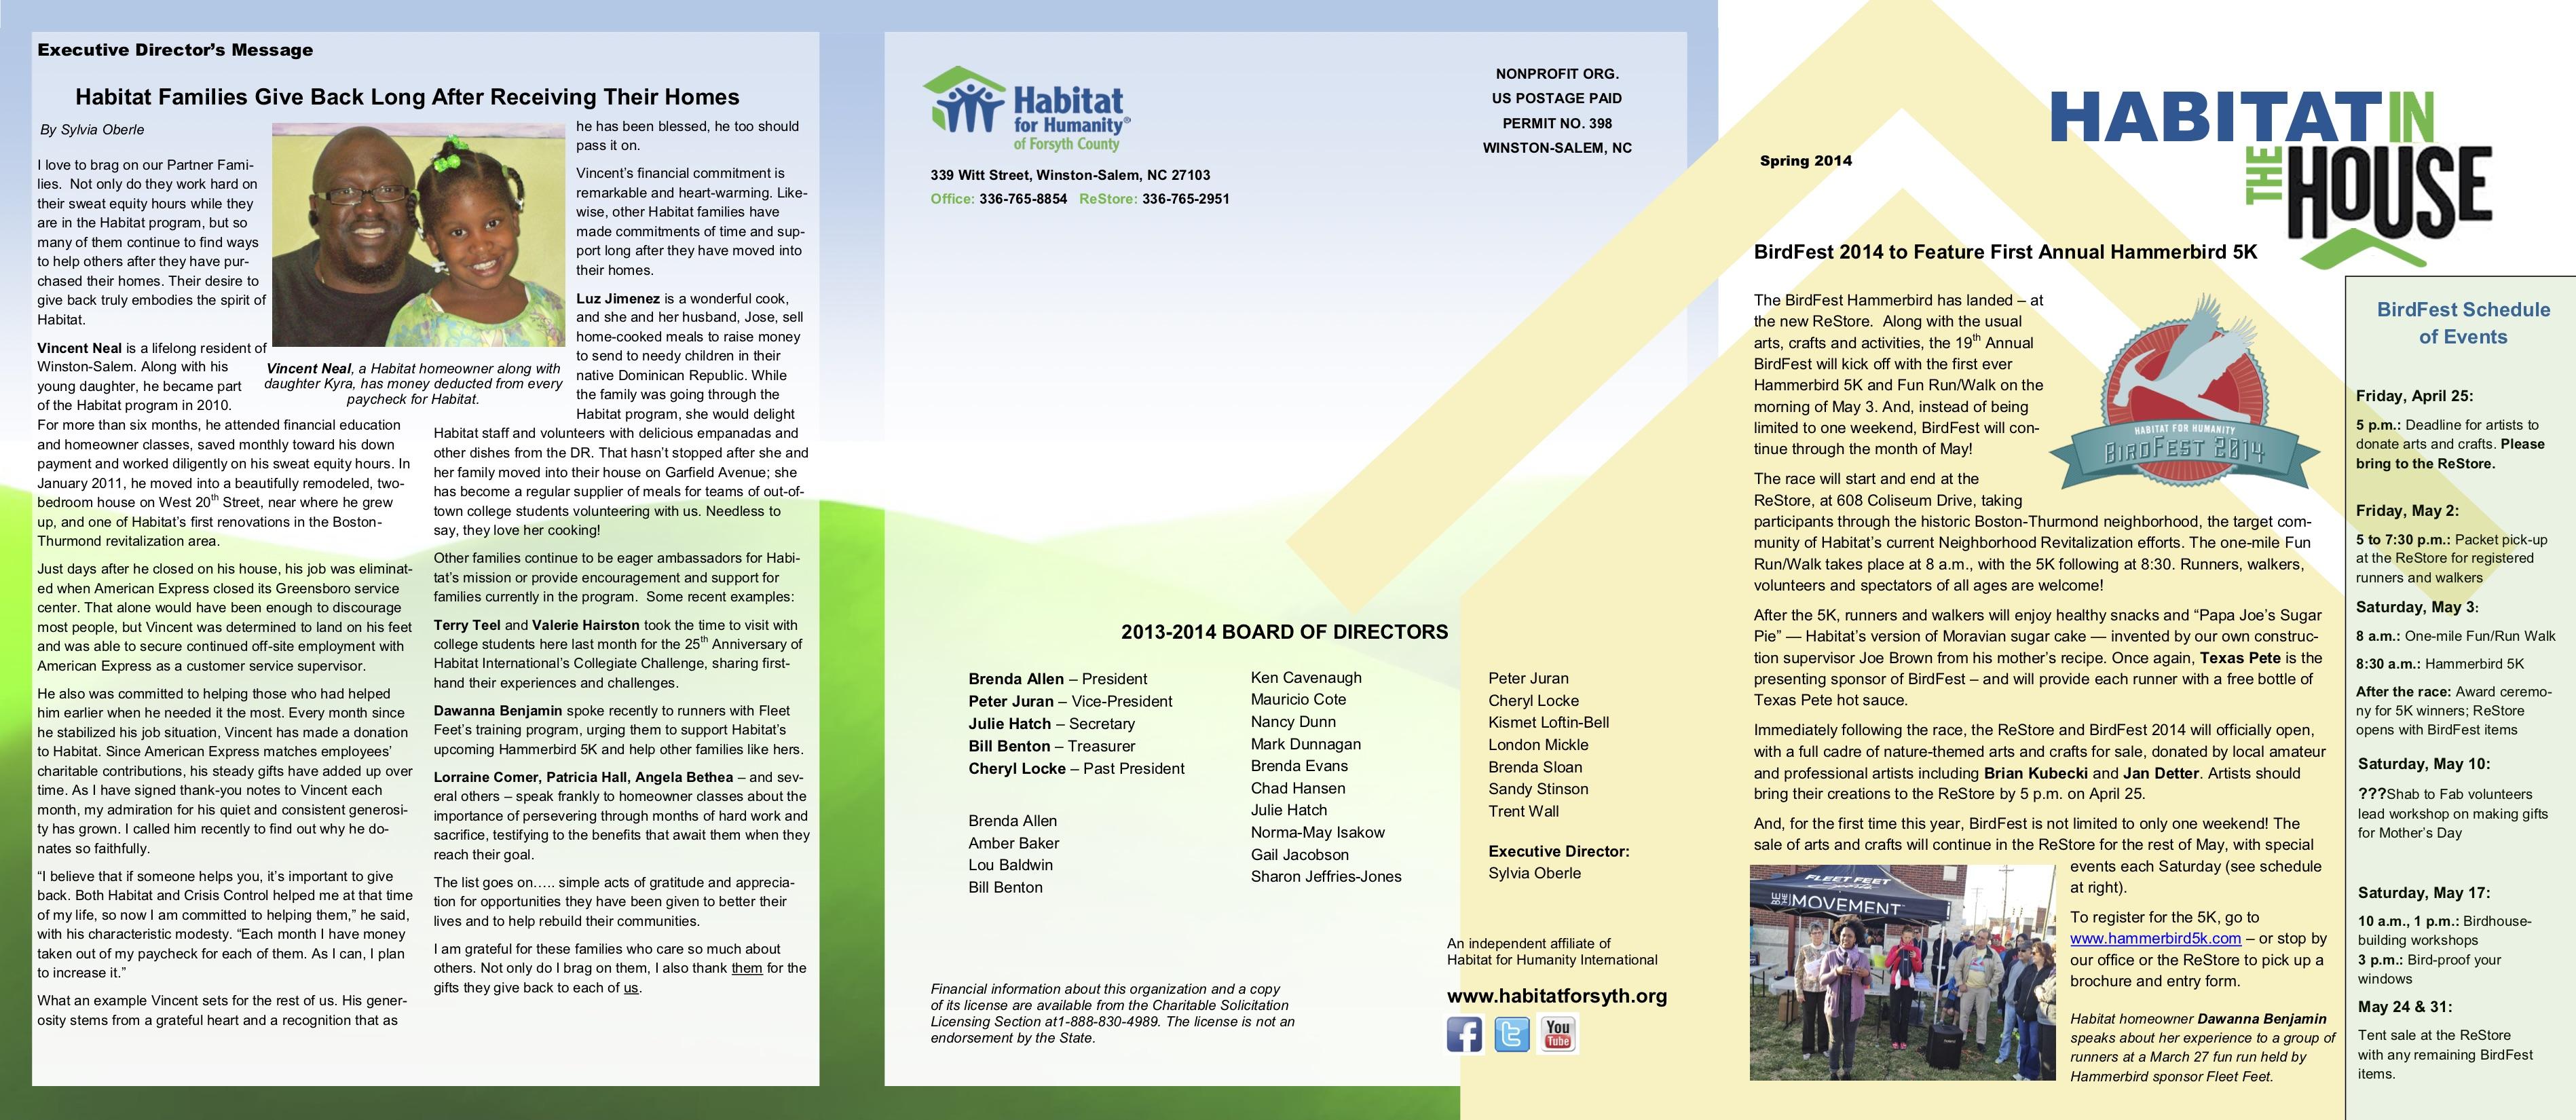 Spring April 2014 Newsletter